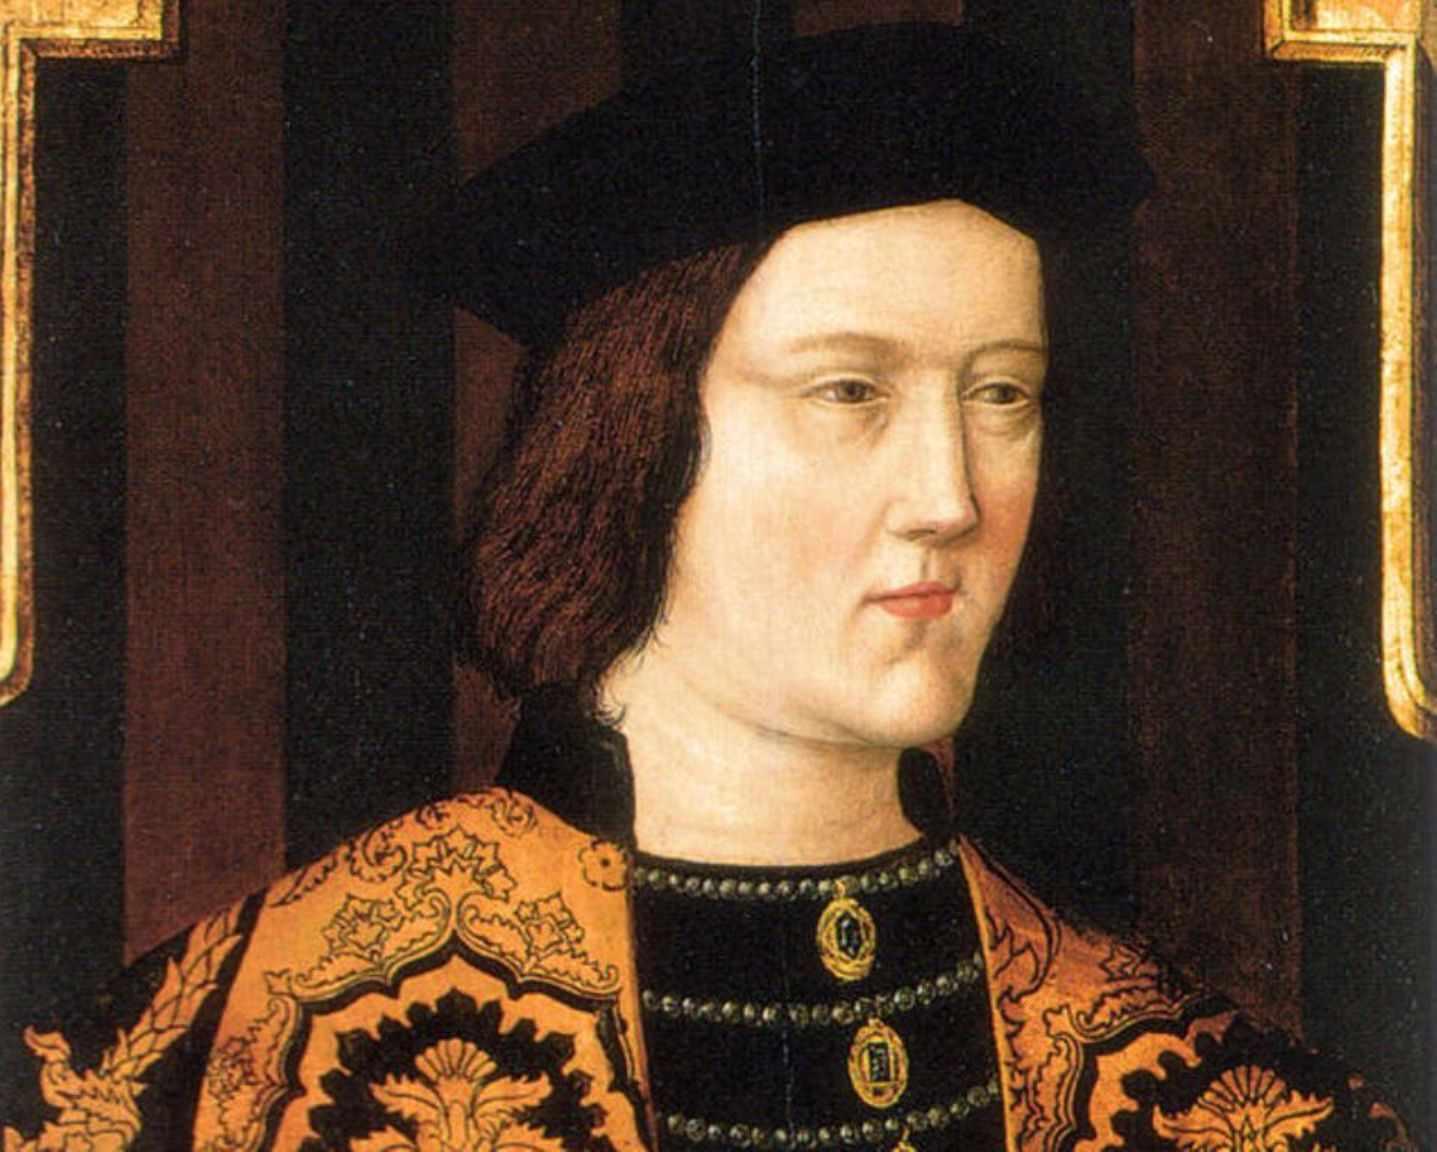 Portrait of King Edward IV in orange robes and a black hat.